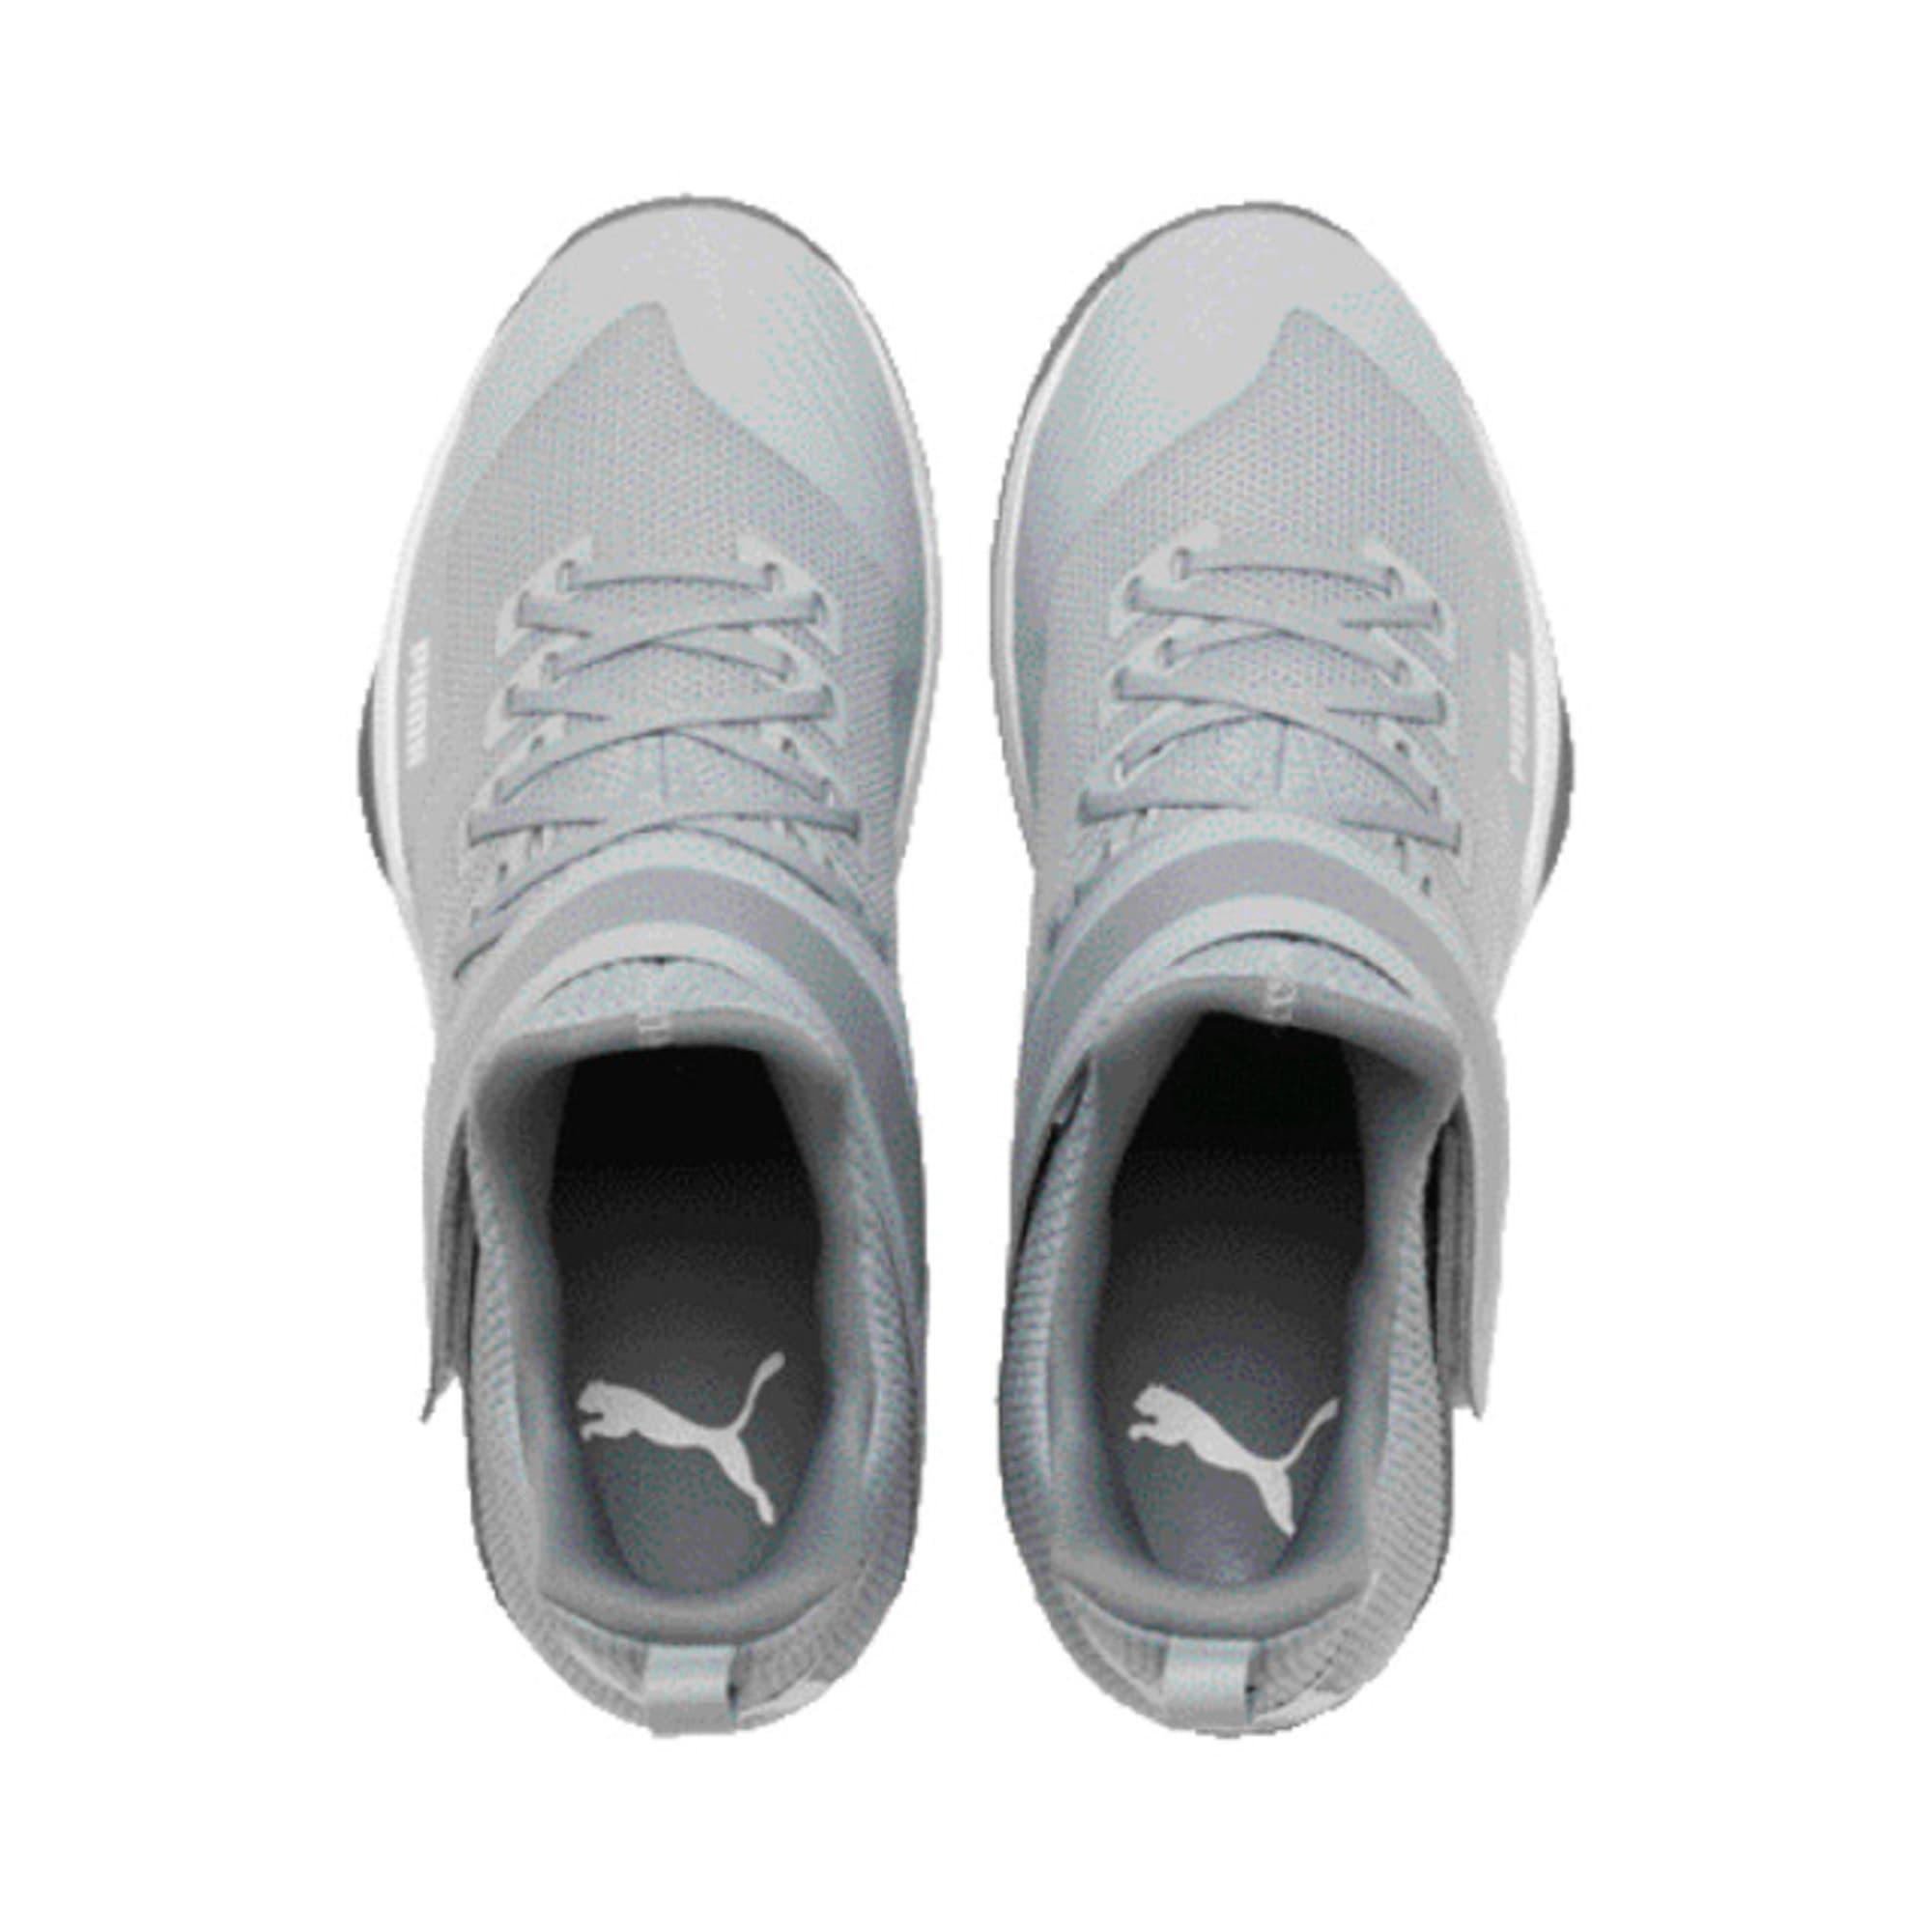 Thumbnail 4 of Rise XT3 Handball Shoes, Grey Dawn-White-Tradewinds, medium-IND